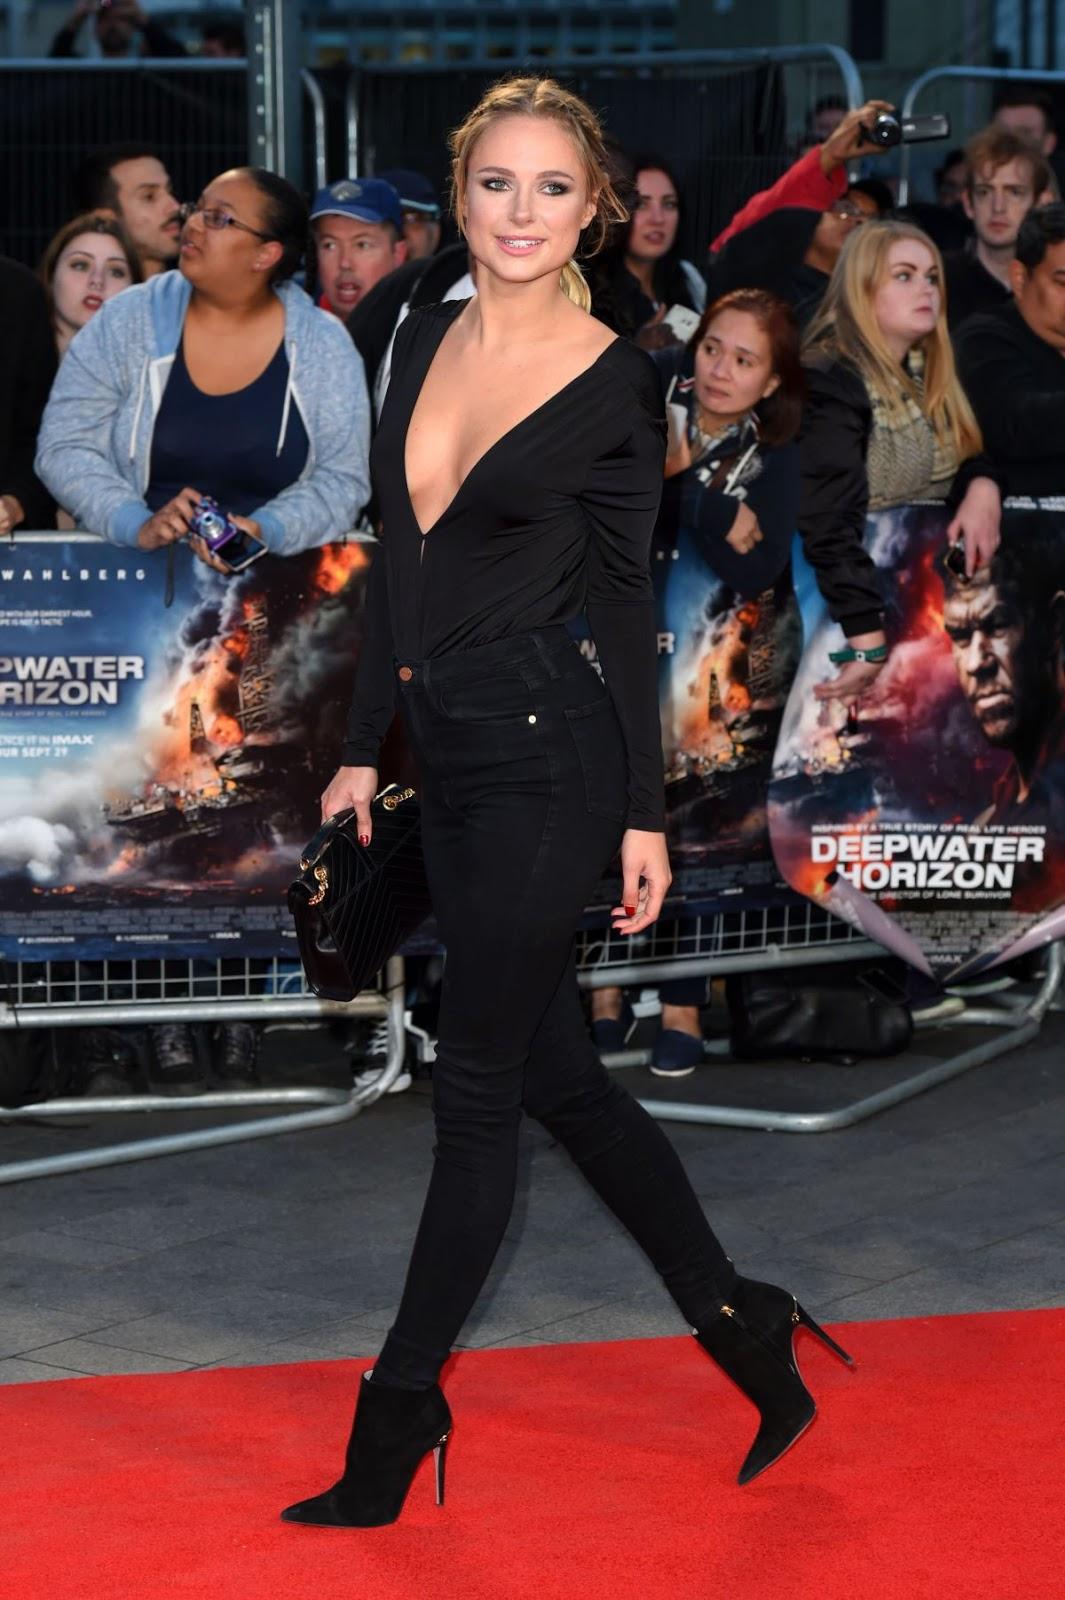 Kimberley Garner at 'Deepwater Horizon' Premiere